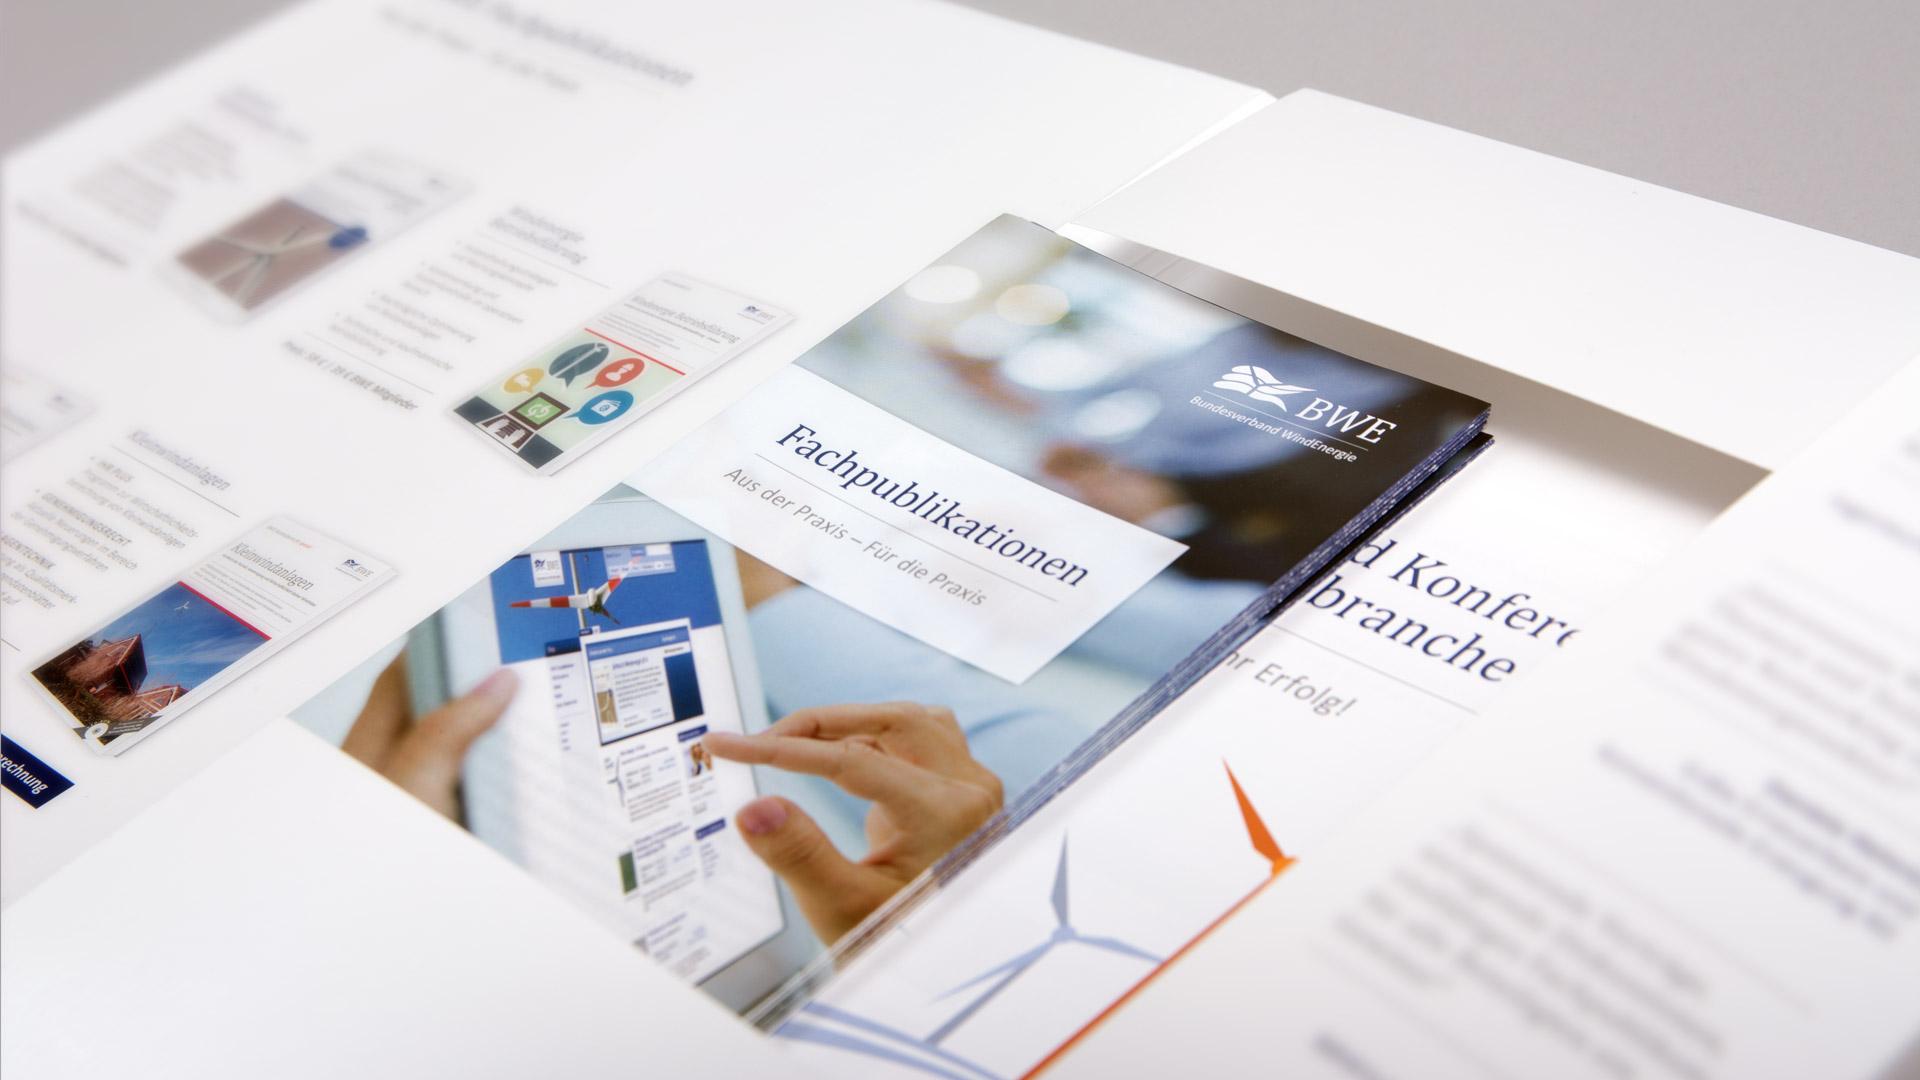 Präsentationsmappe mit allen Materialien BWE Service